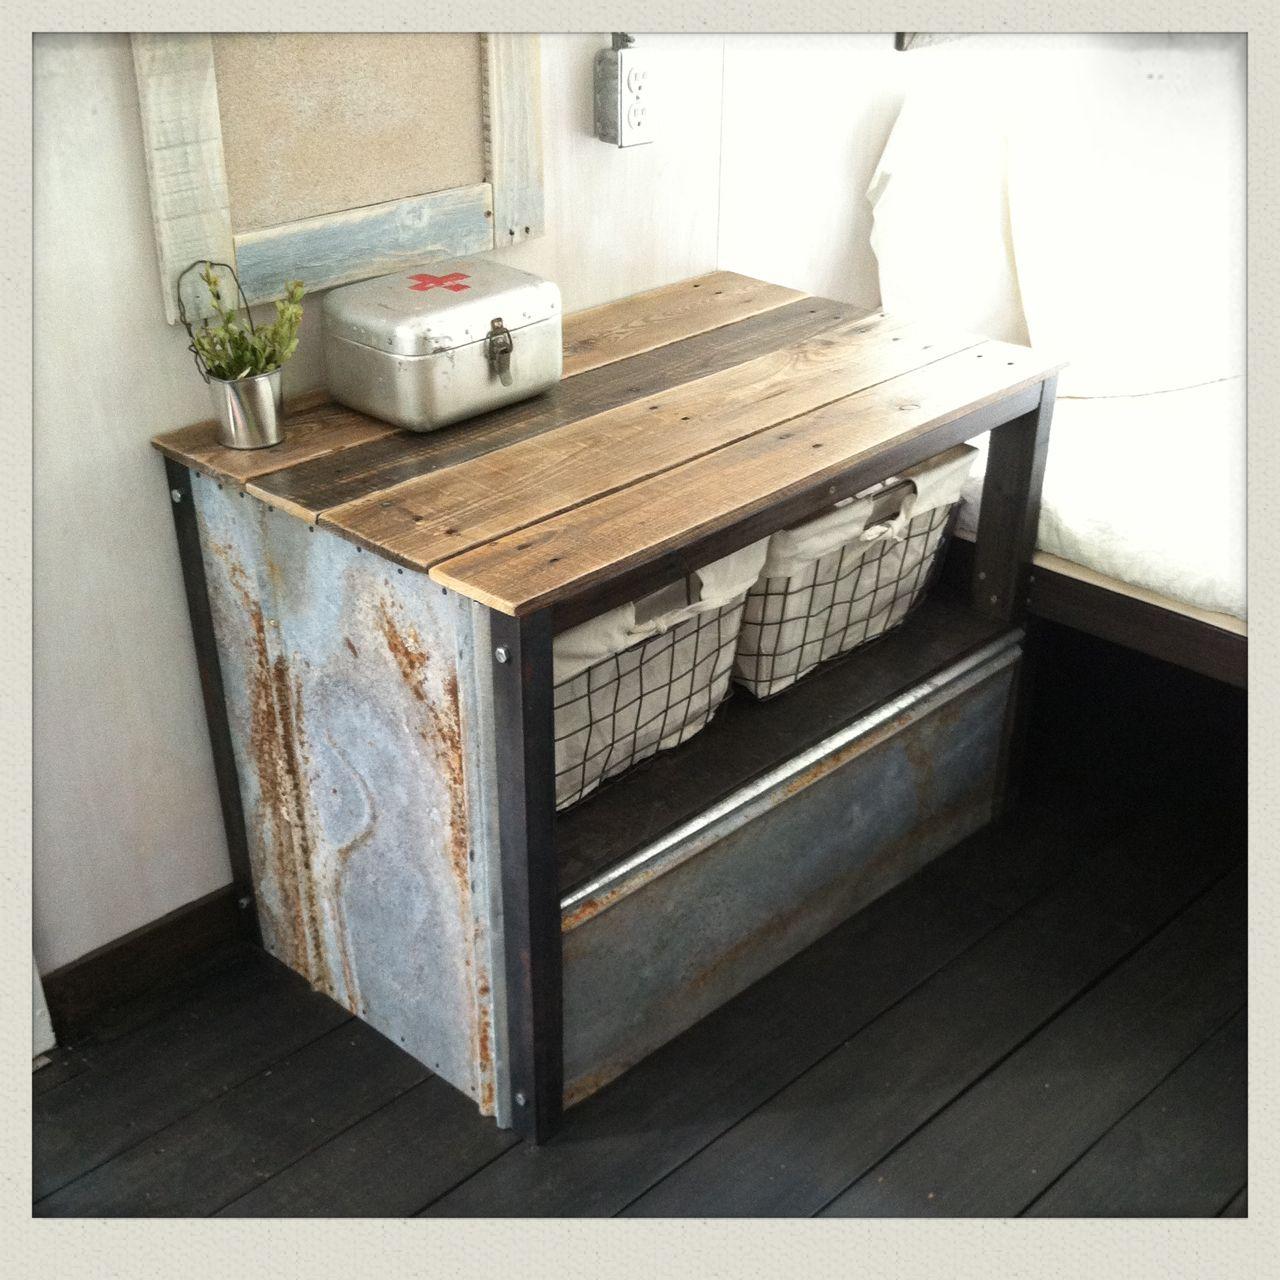 Vintage camper remodel / table/storage over wheel box